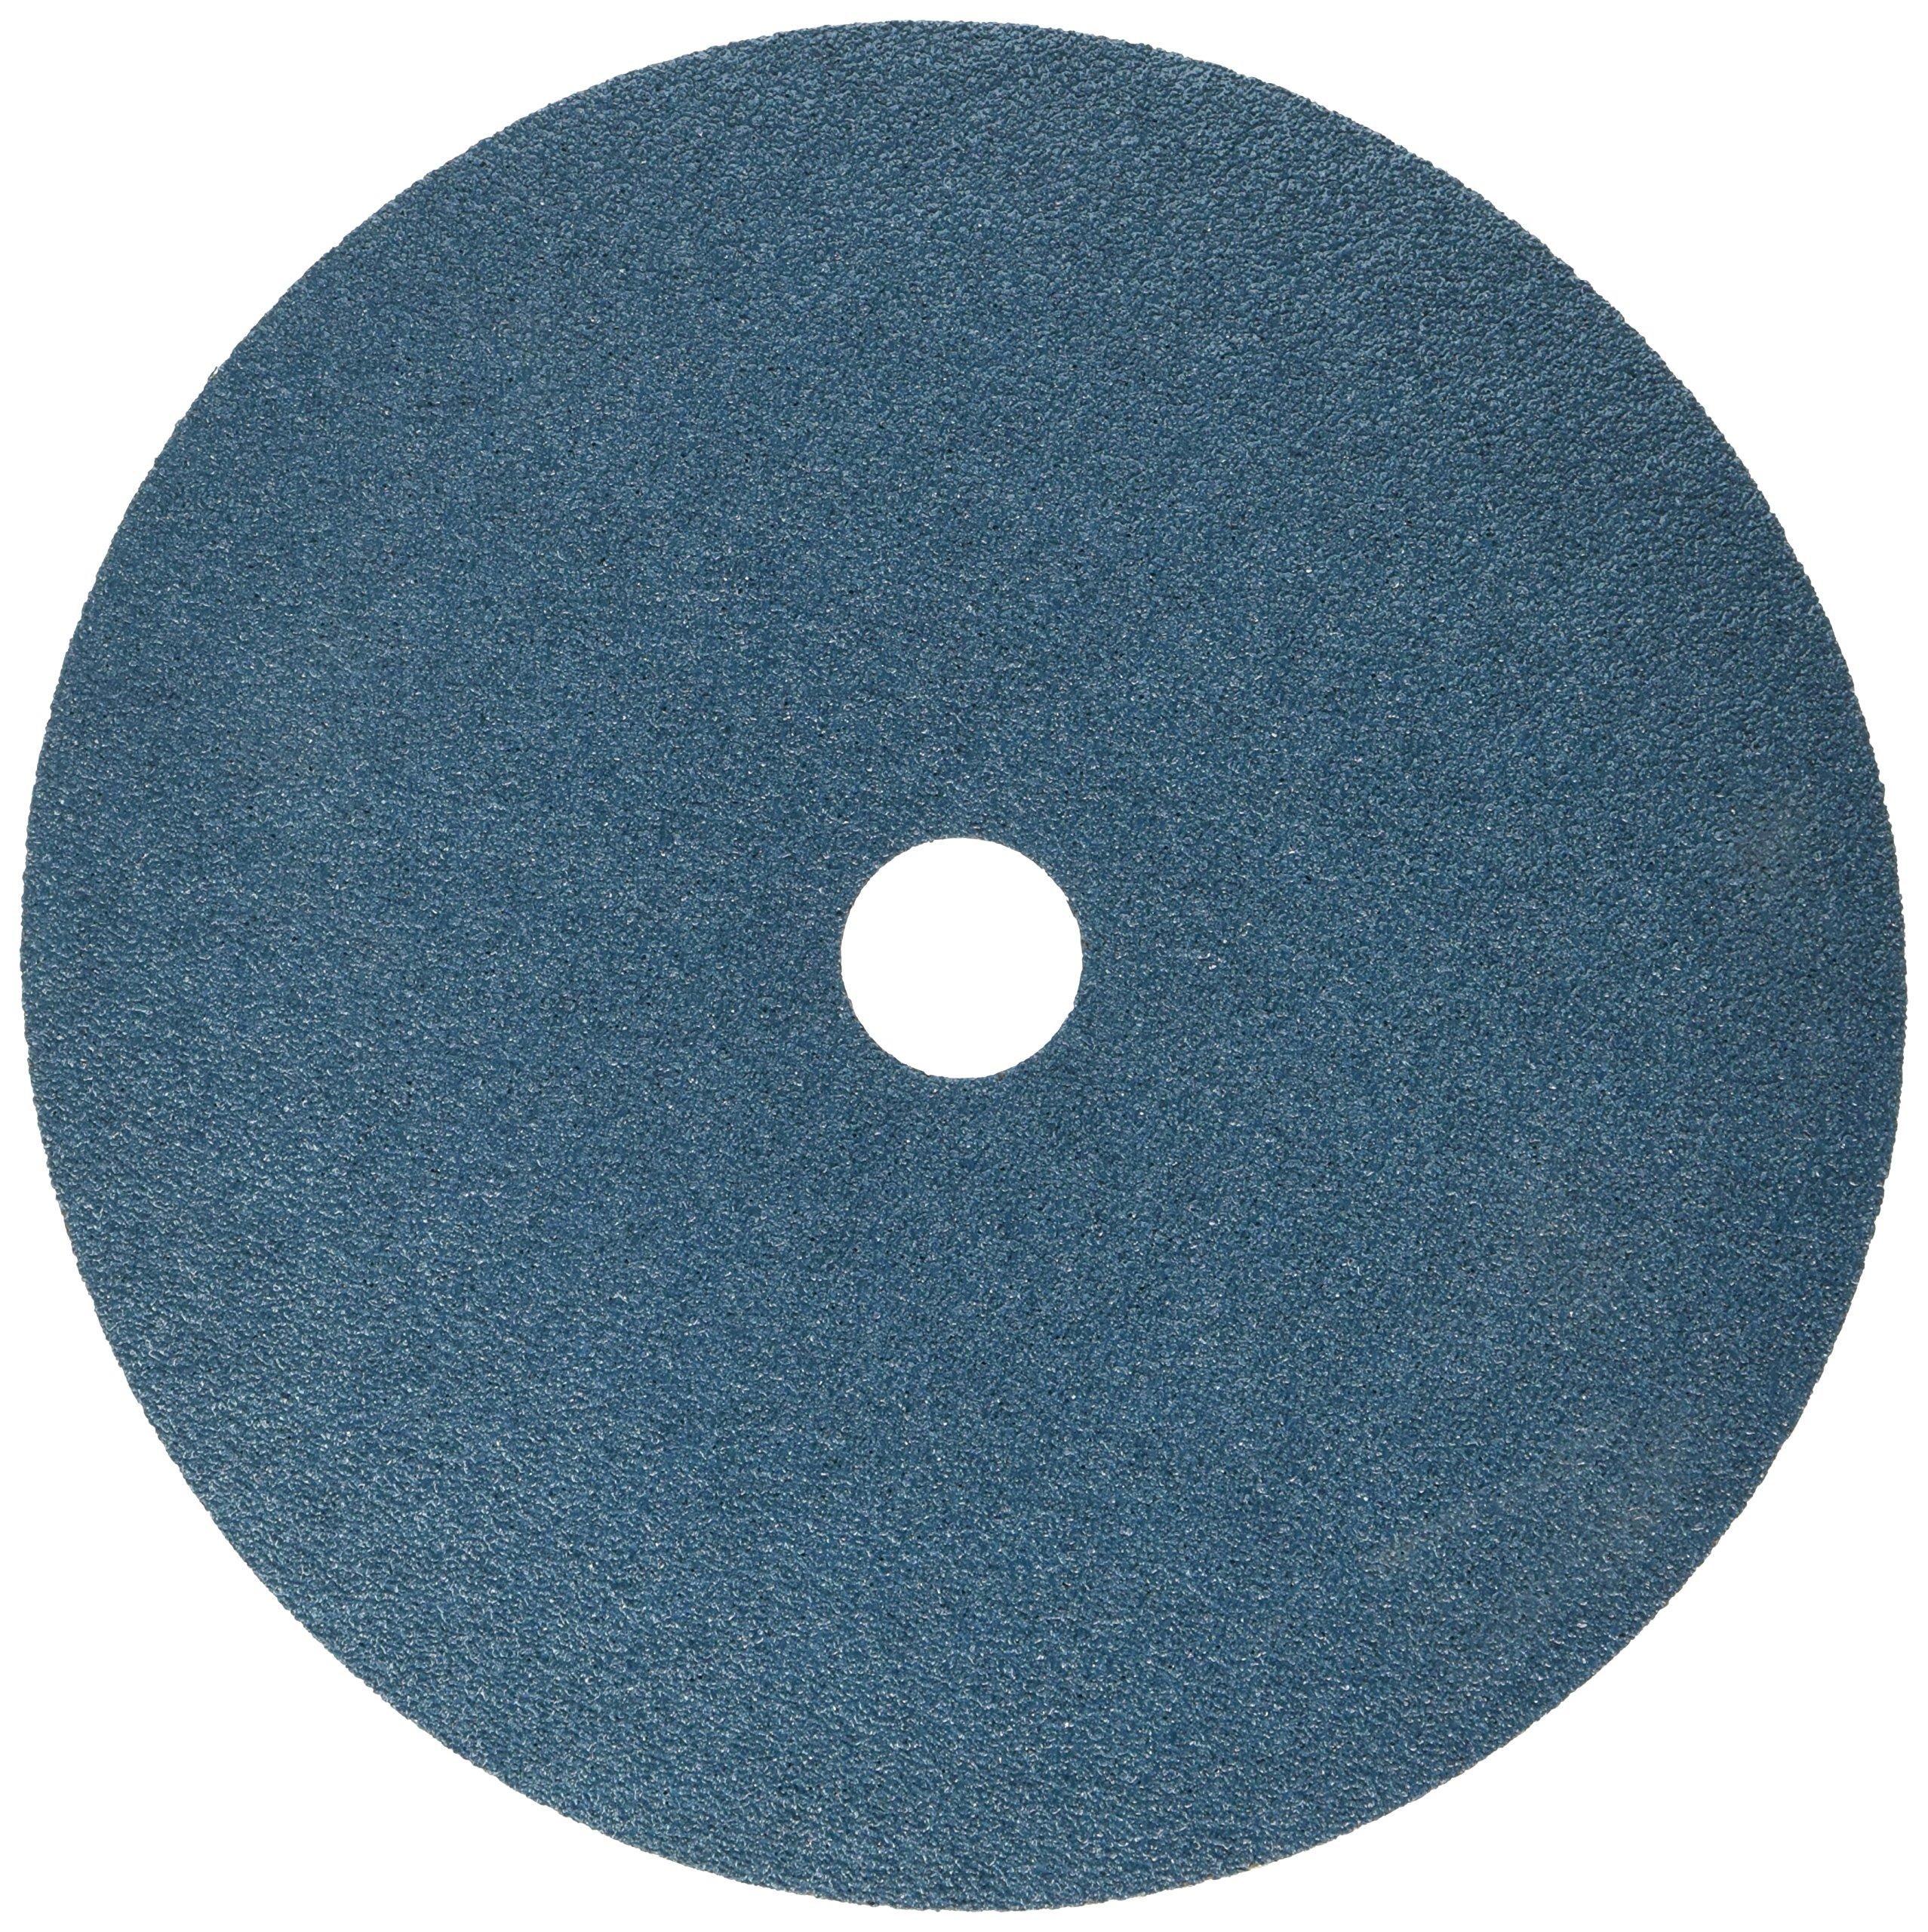 United Abrasives-SAIT 59750 SAIT Fiber Disc, Z 7 X 7/8 50X Blue Line Disc, 25 Pack